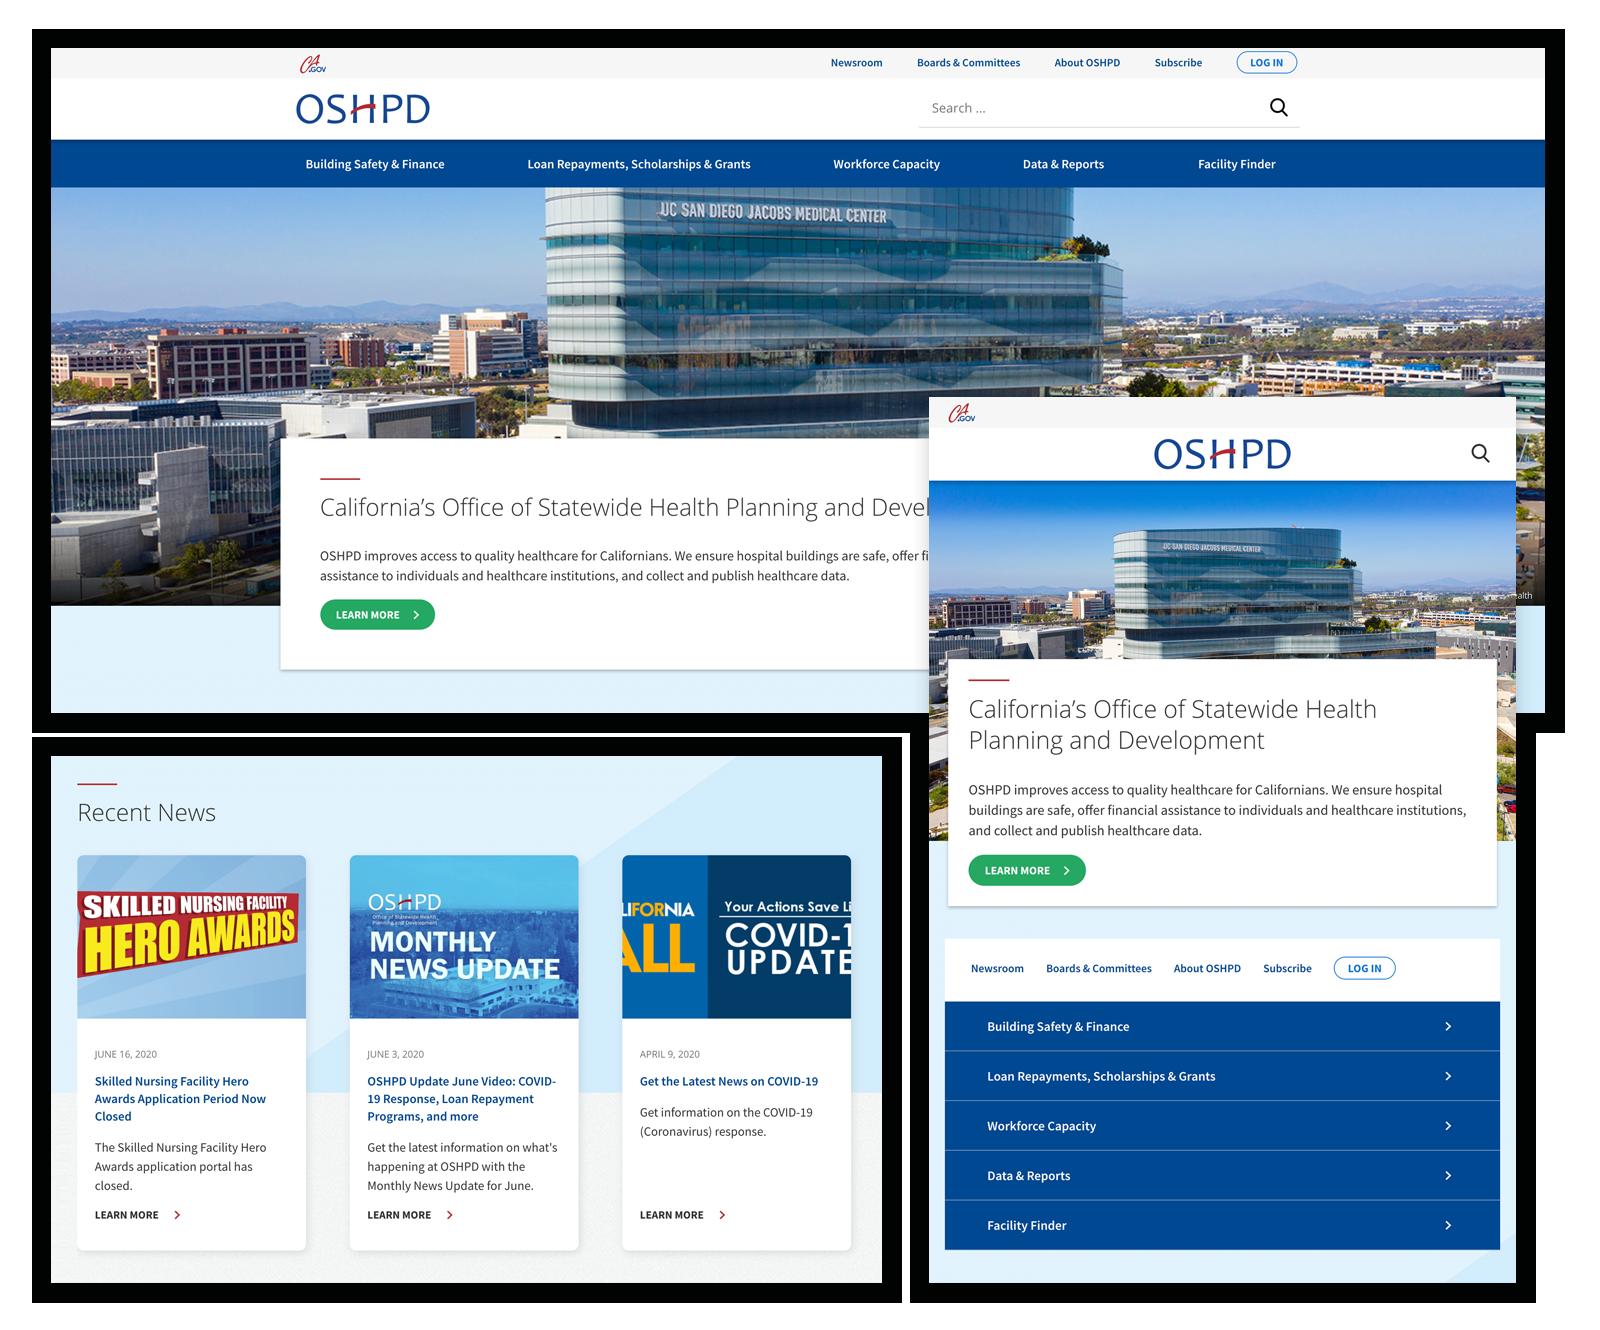 OSHPD.ca.gov Website Redesign